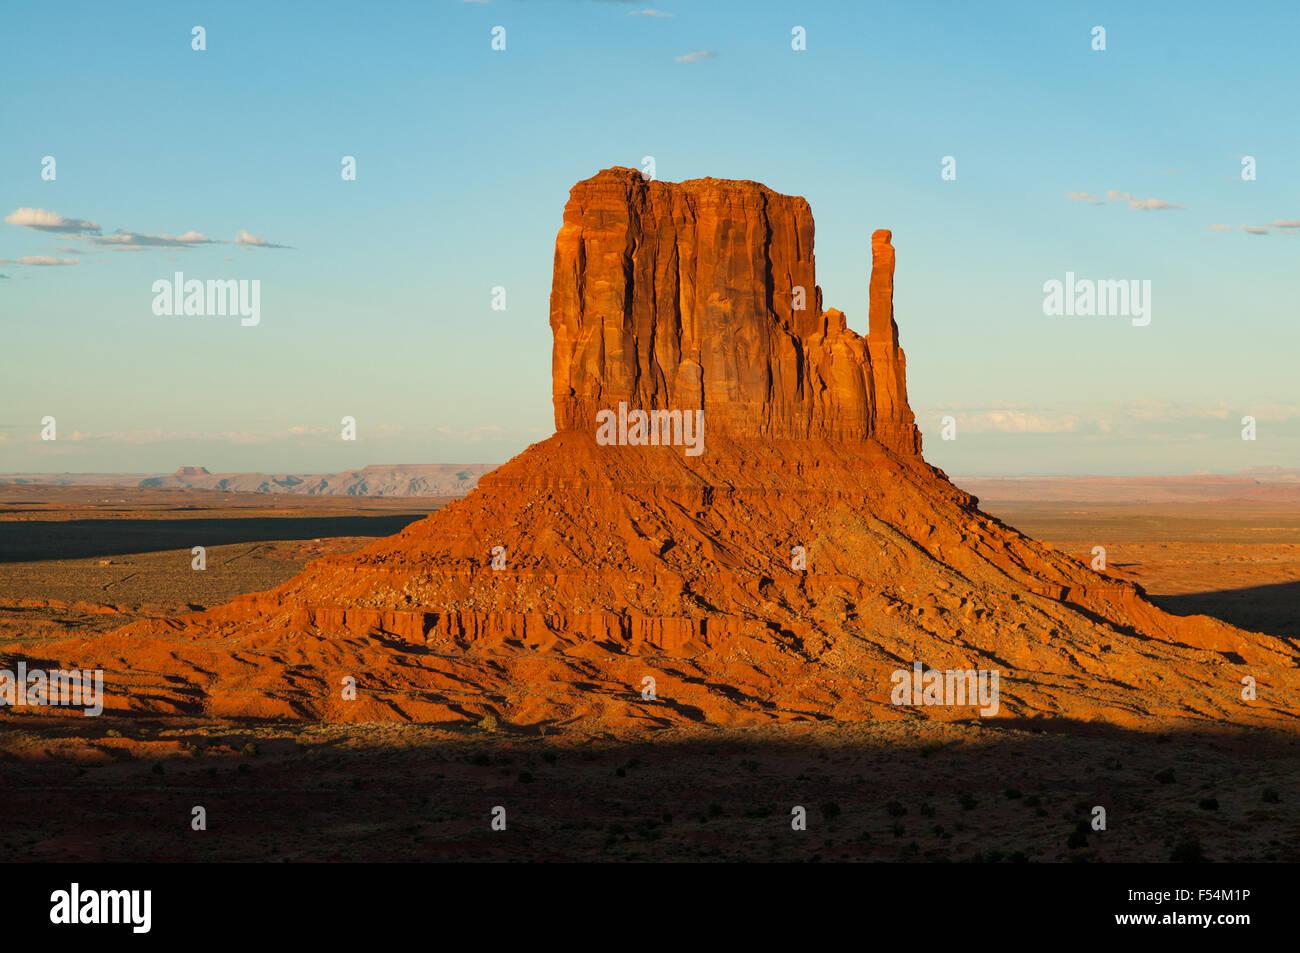 West Mitten Near Sunset Monument Valley Arizona Usa Stock Photo Alamy